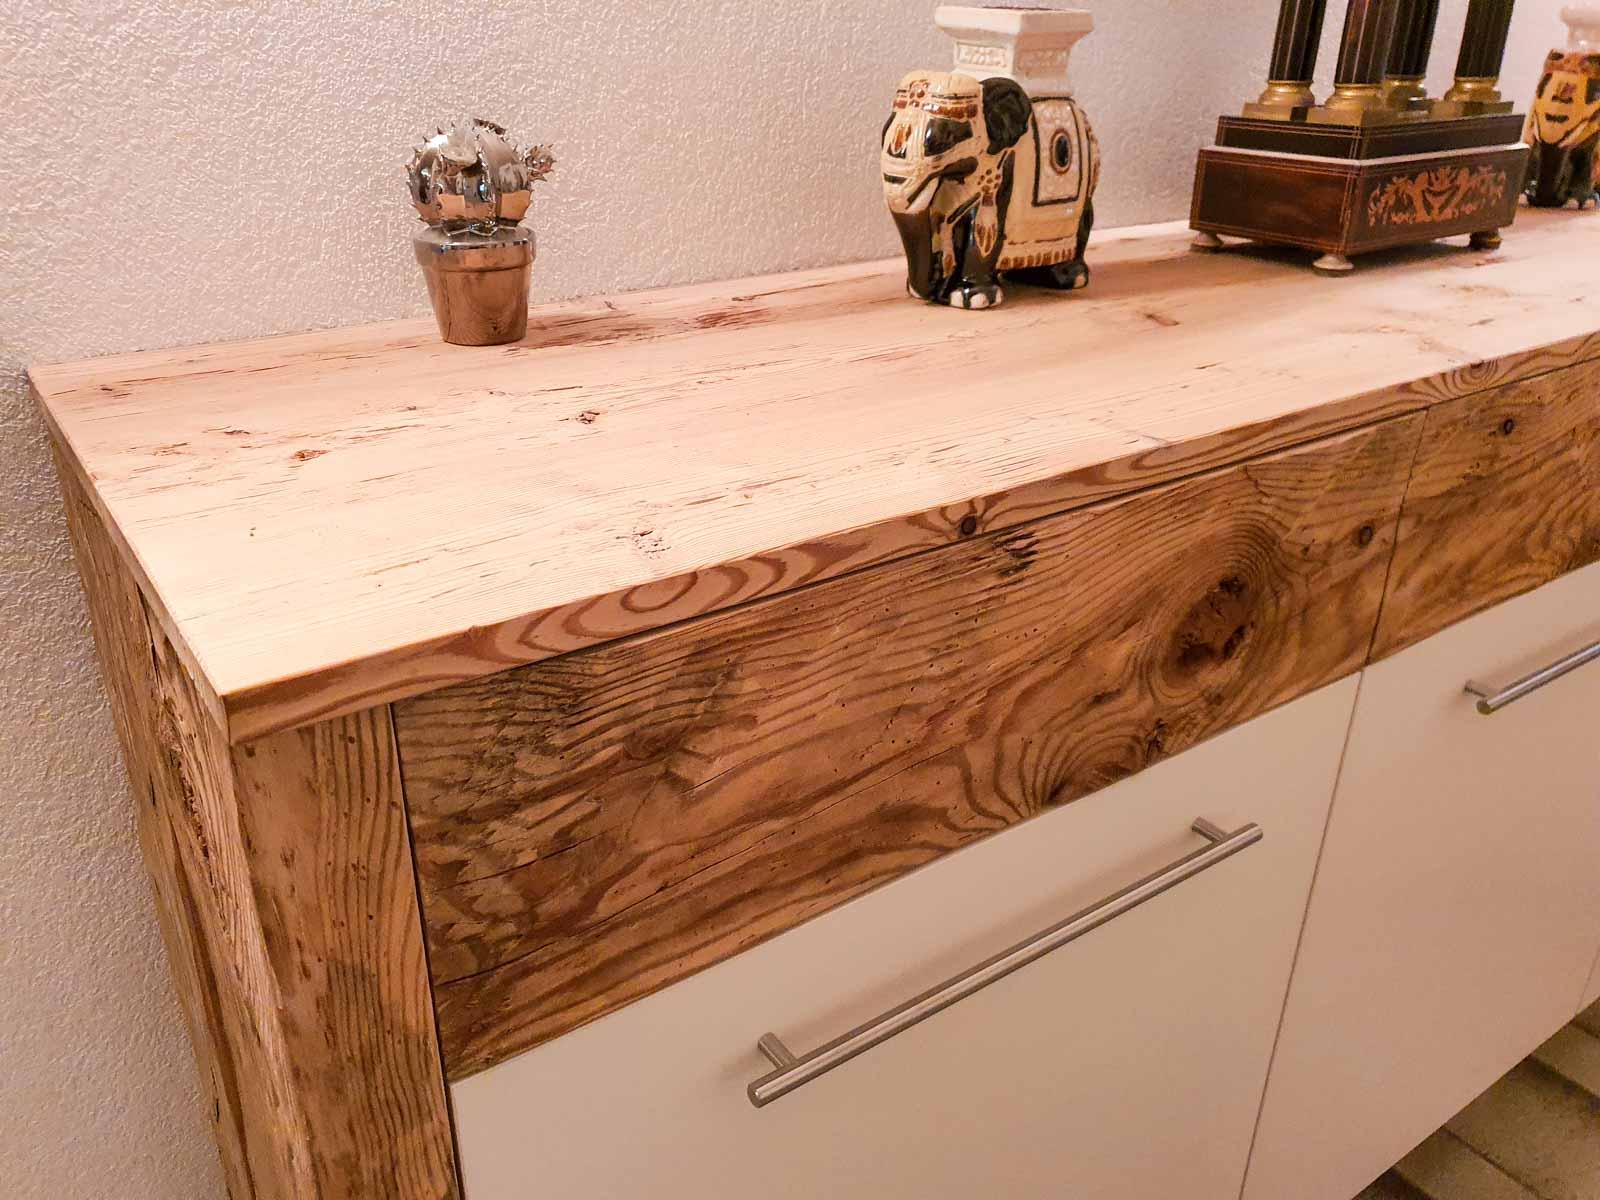 Wooddesign_Garderobe_Gästegarderobe_rustikal_Altholz_Sitzbank_Edelstahl (6)